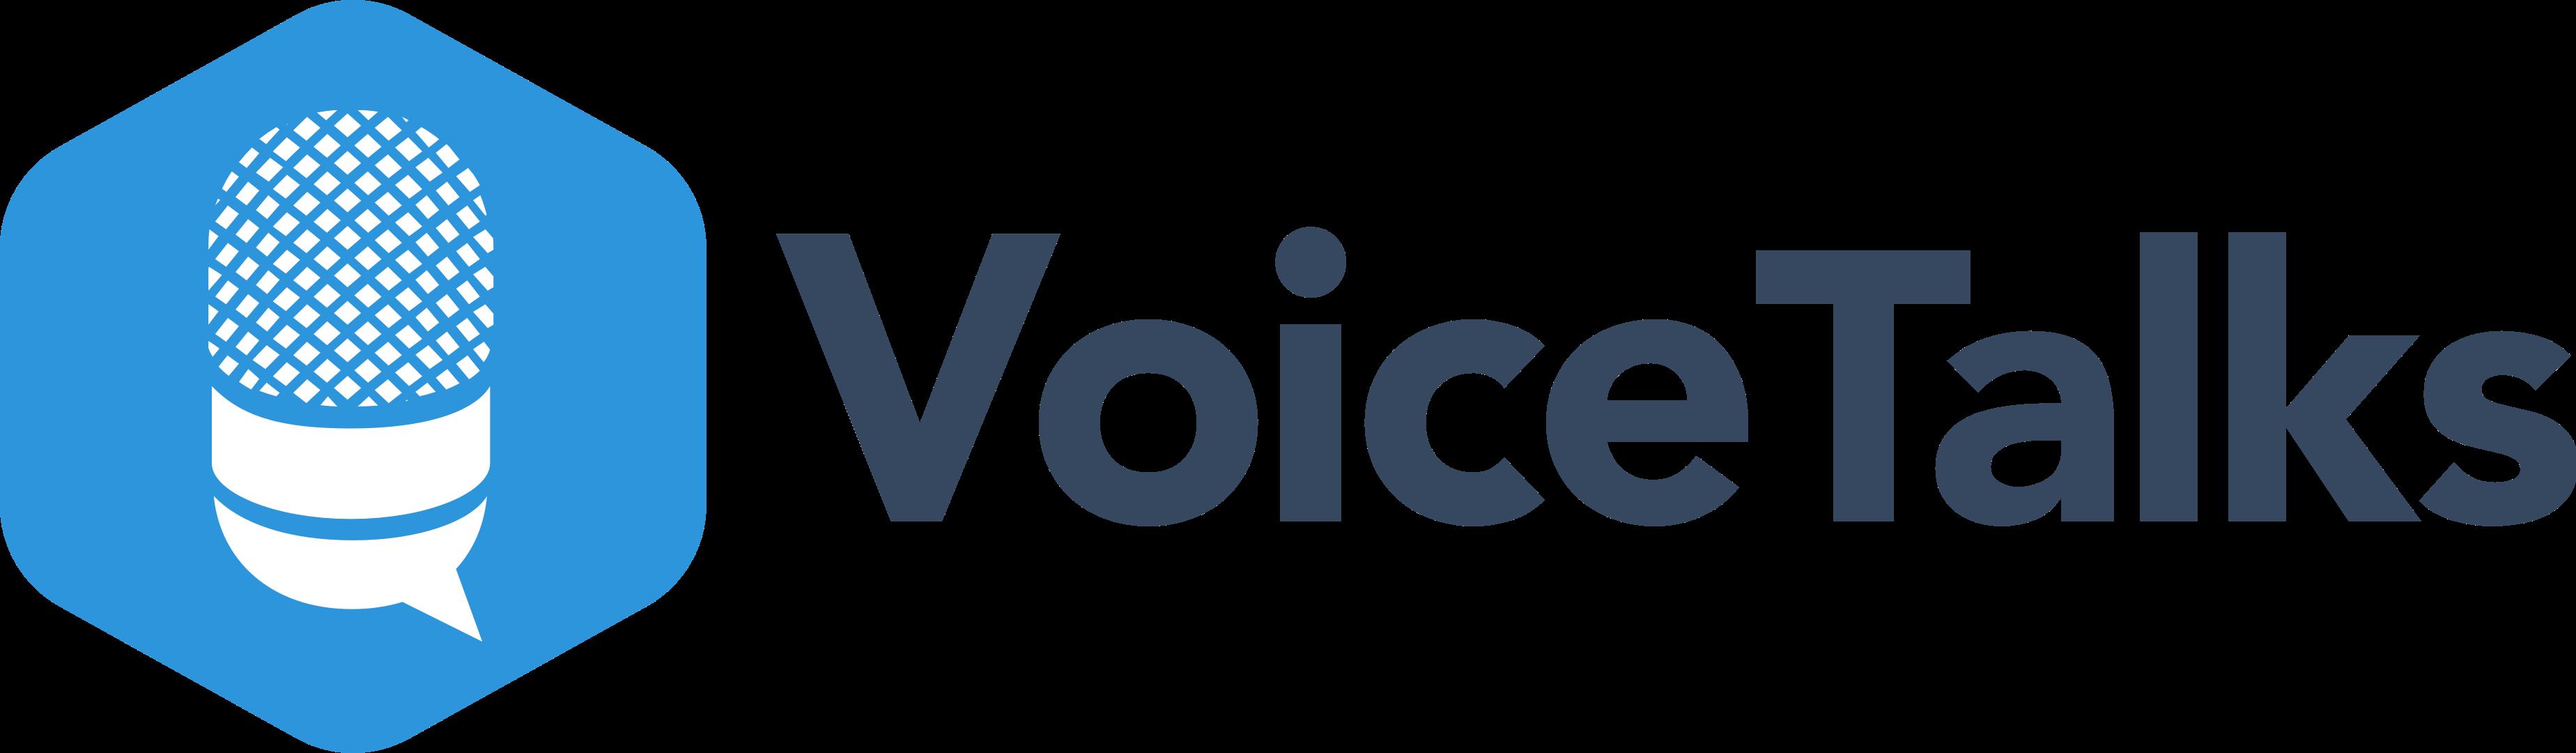 VoiceTalks